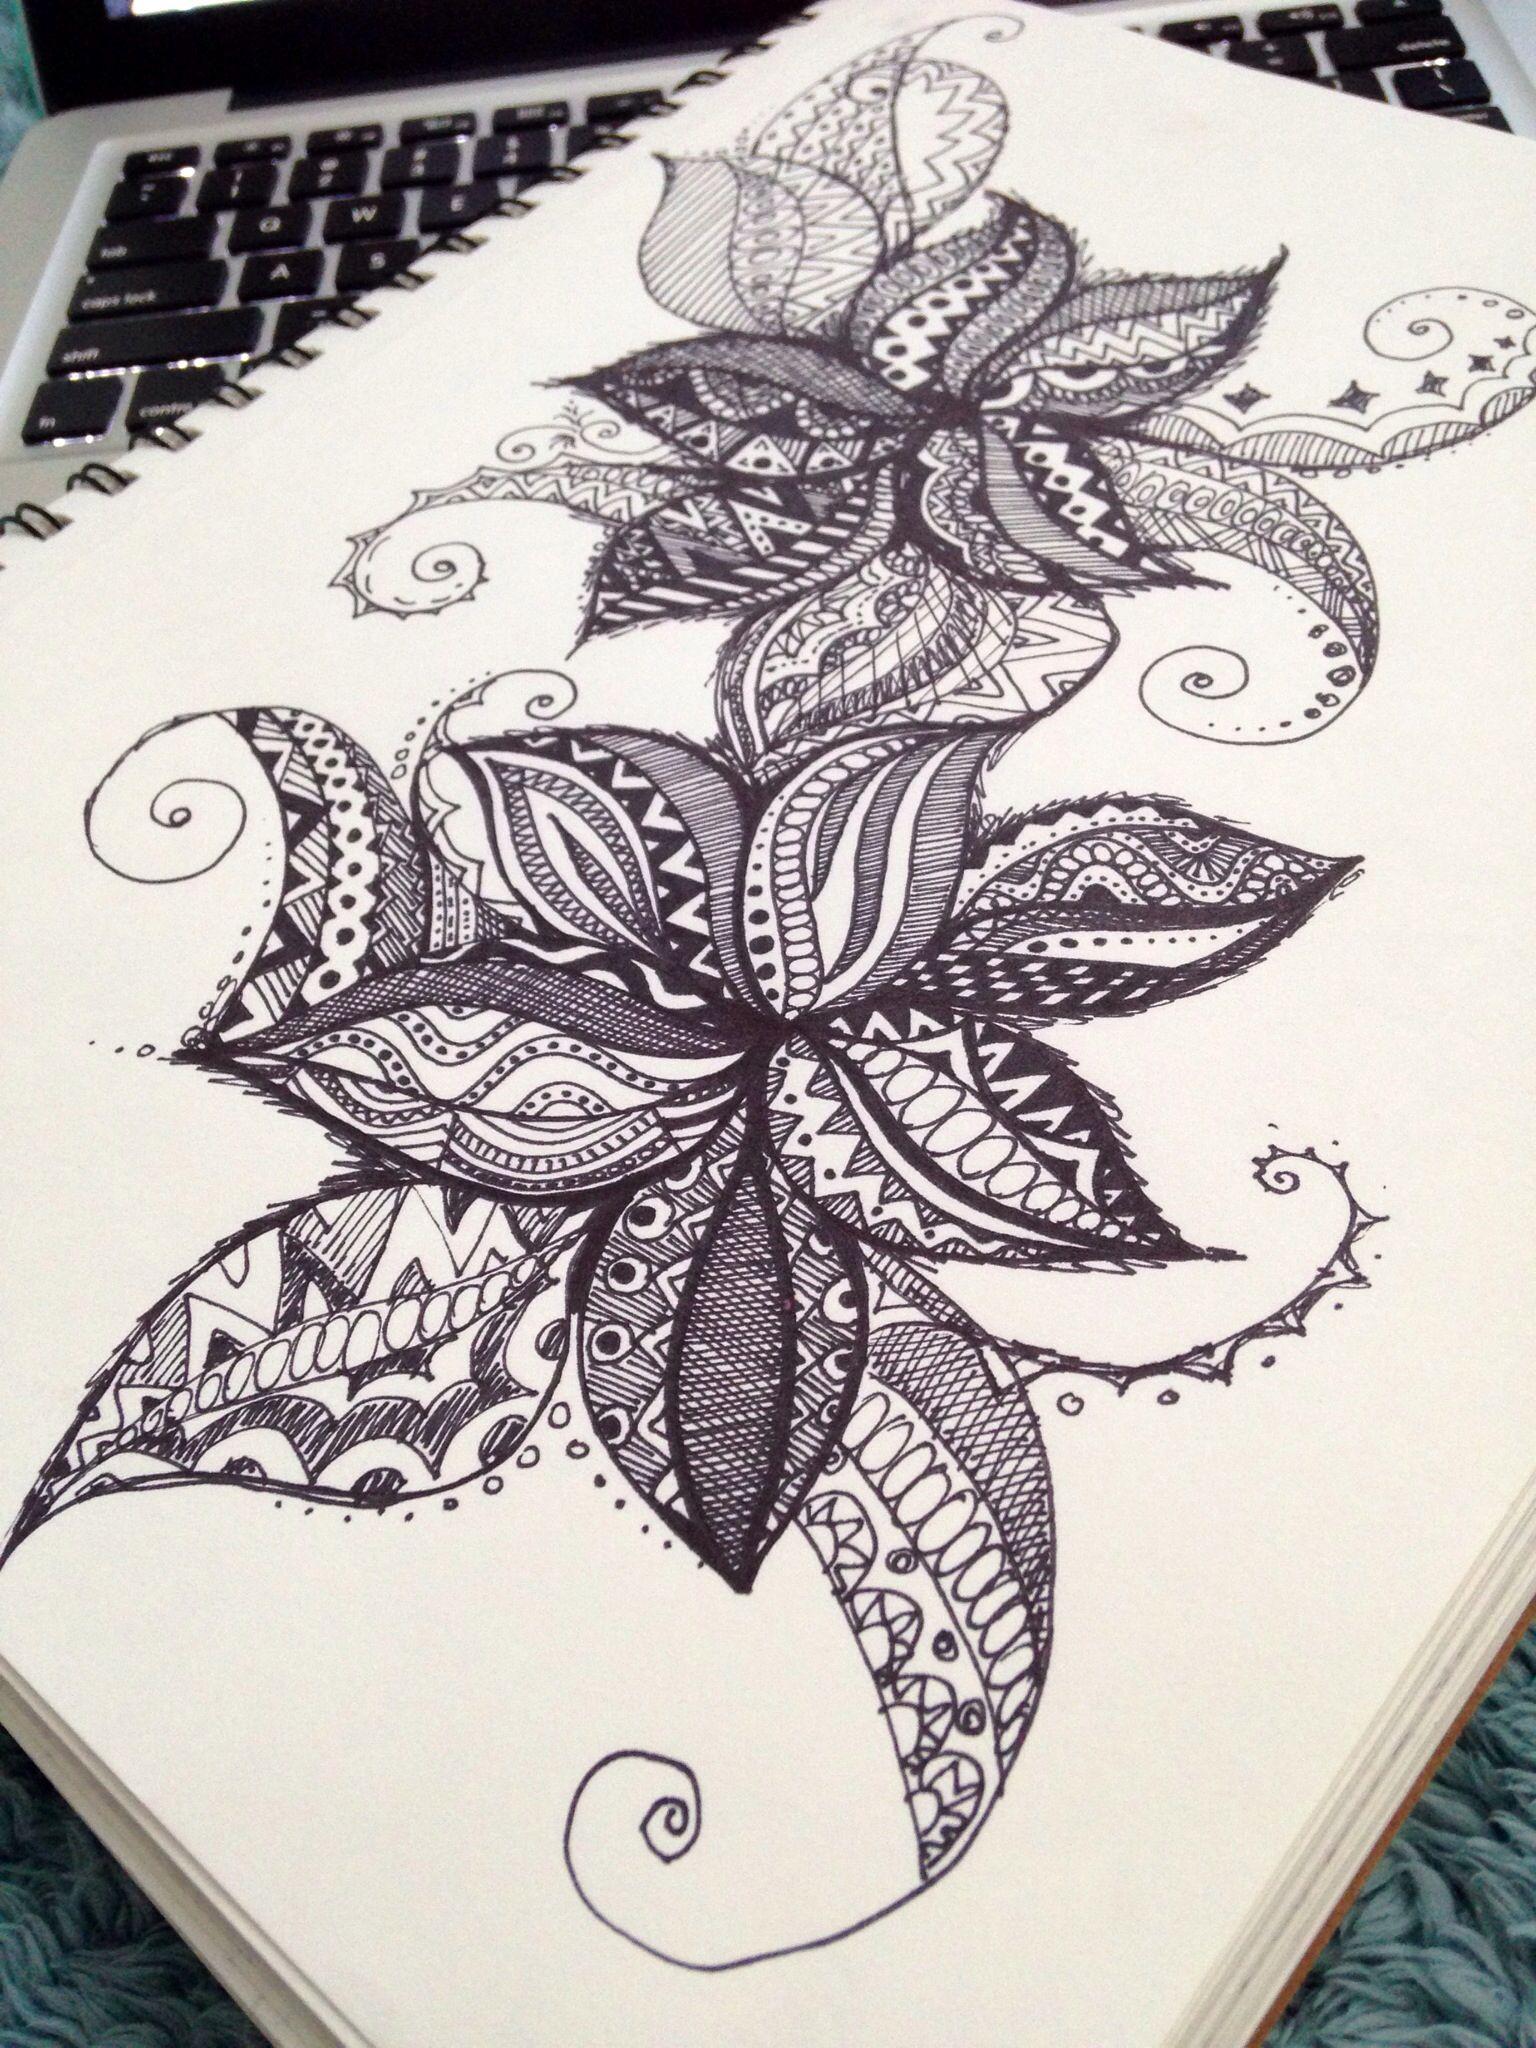 Doodle. Art. Sharpie drawing. By Maryana Kostyuk